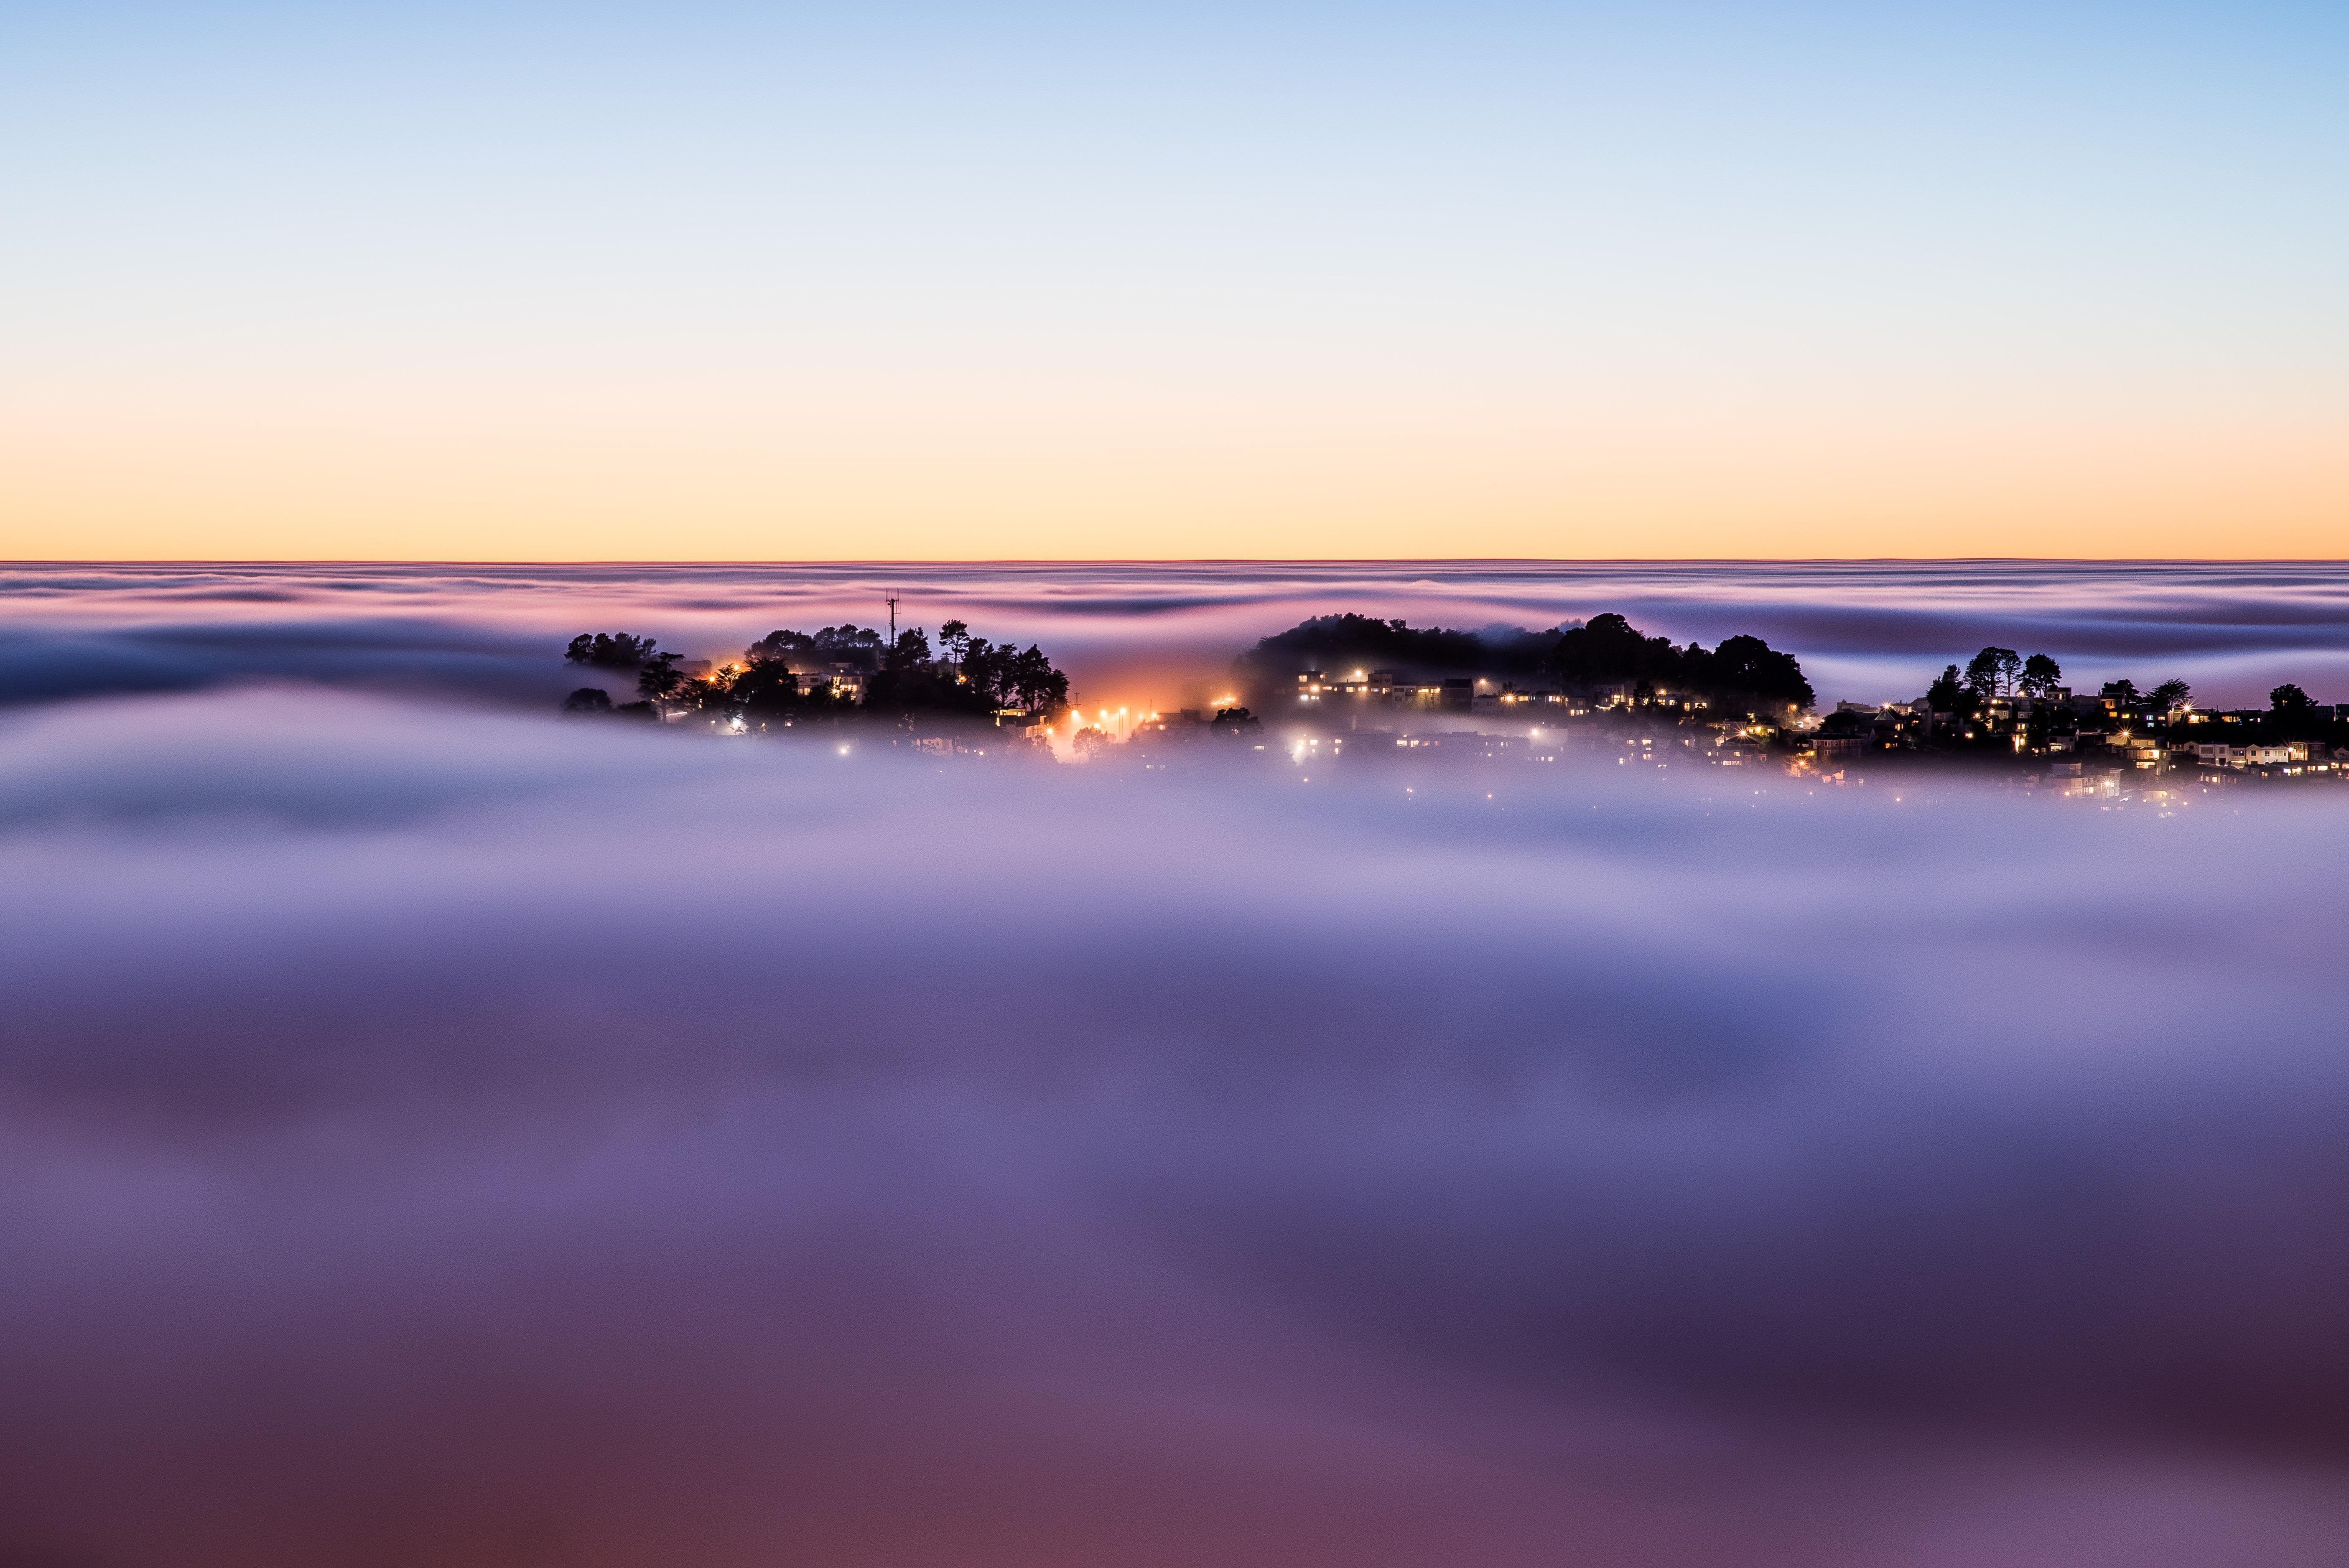 The foggy sunrise over Twin Peaks in San Francisco